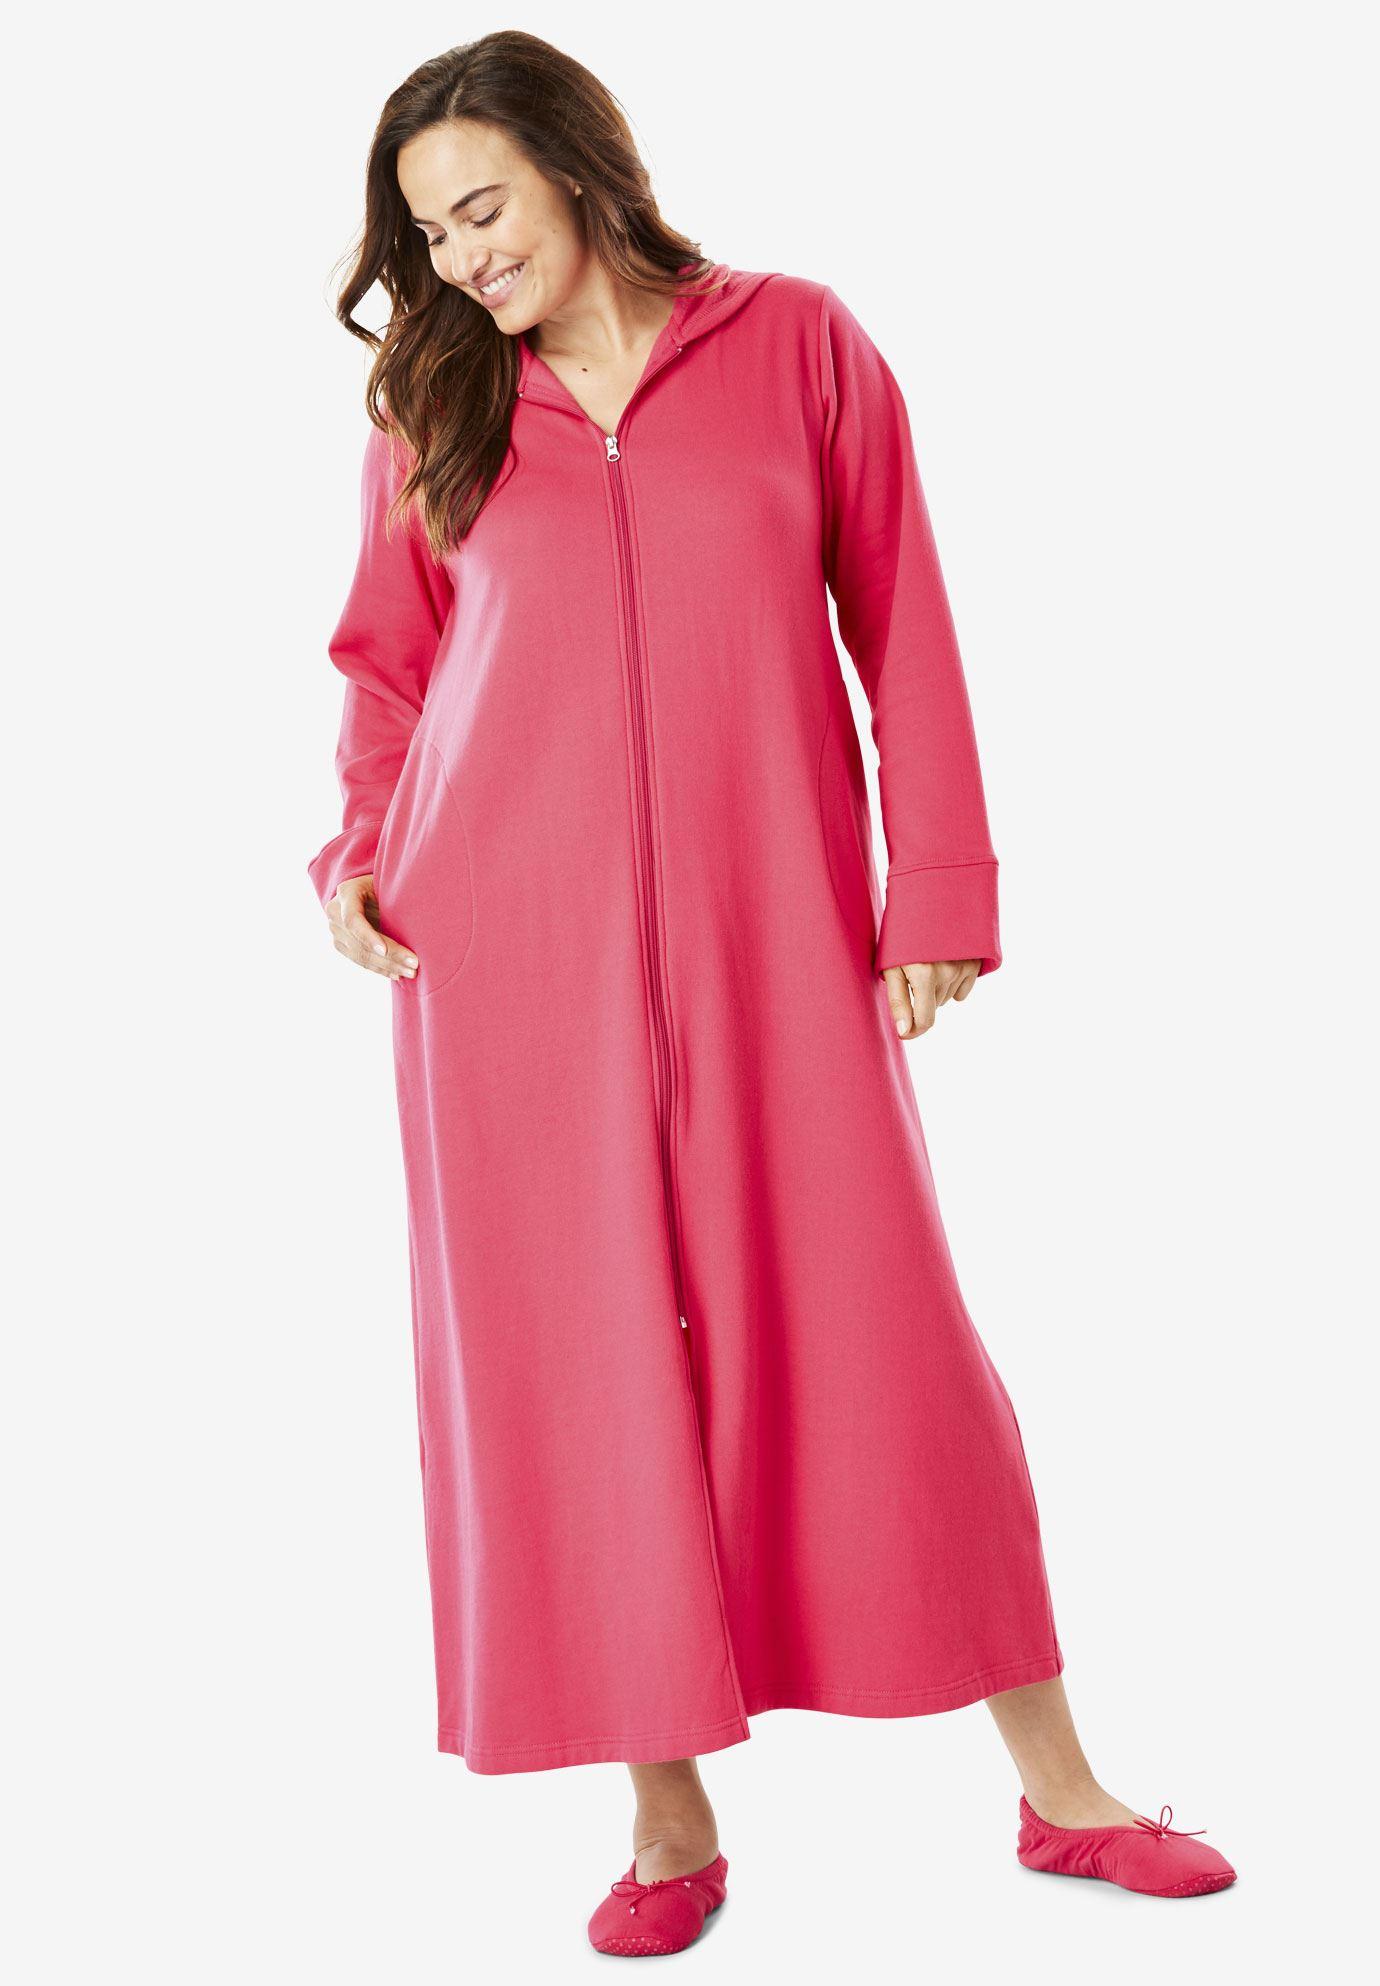 Long Fleece Hooded Robe by Dreams & Co.® | Plus Size Petites ...